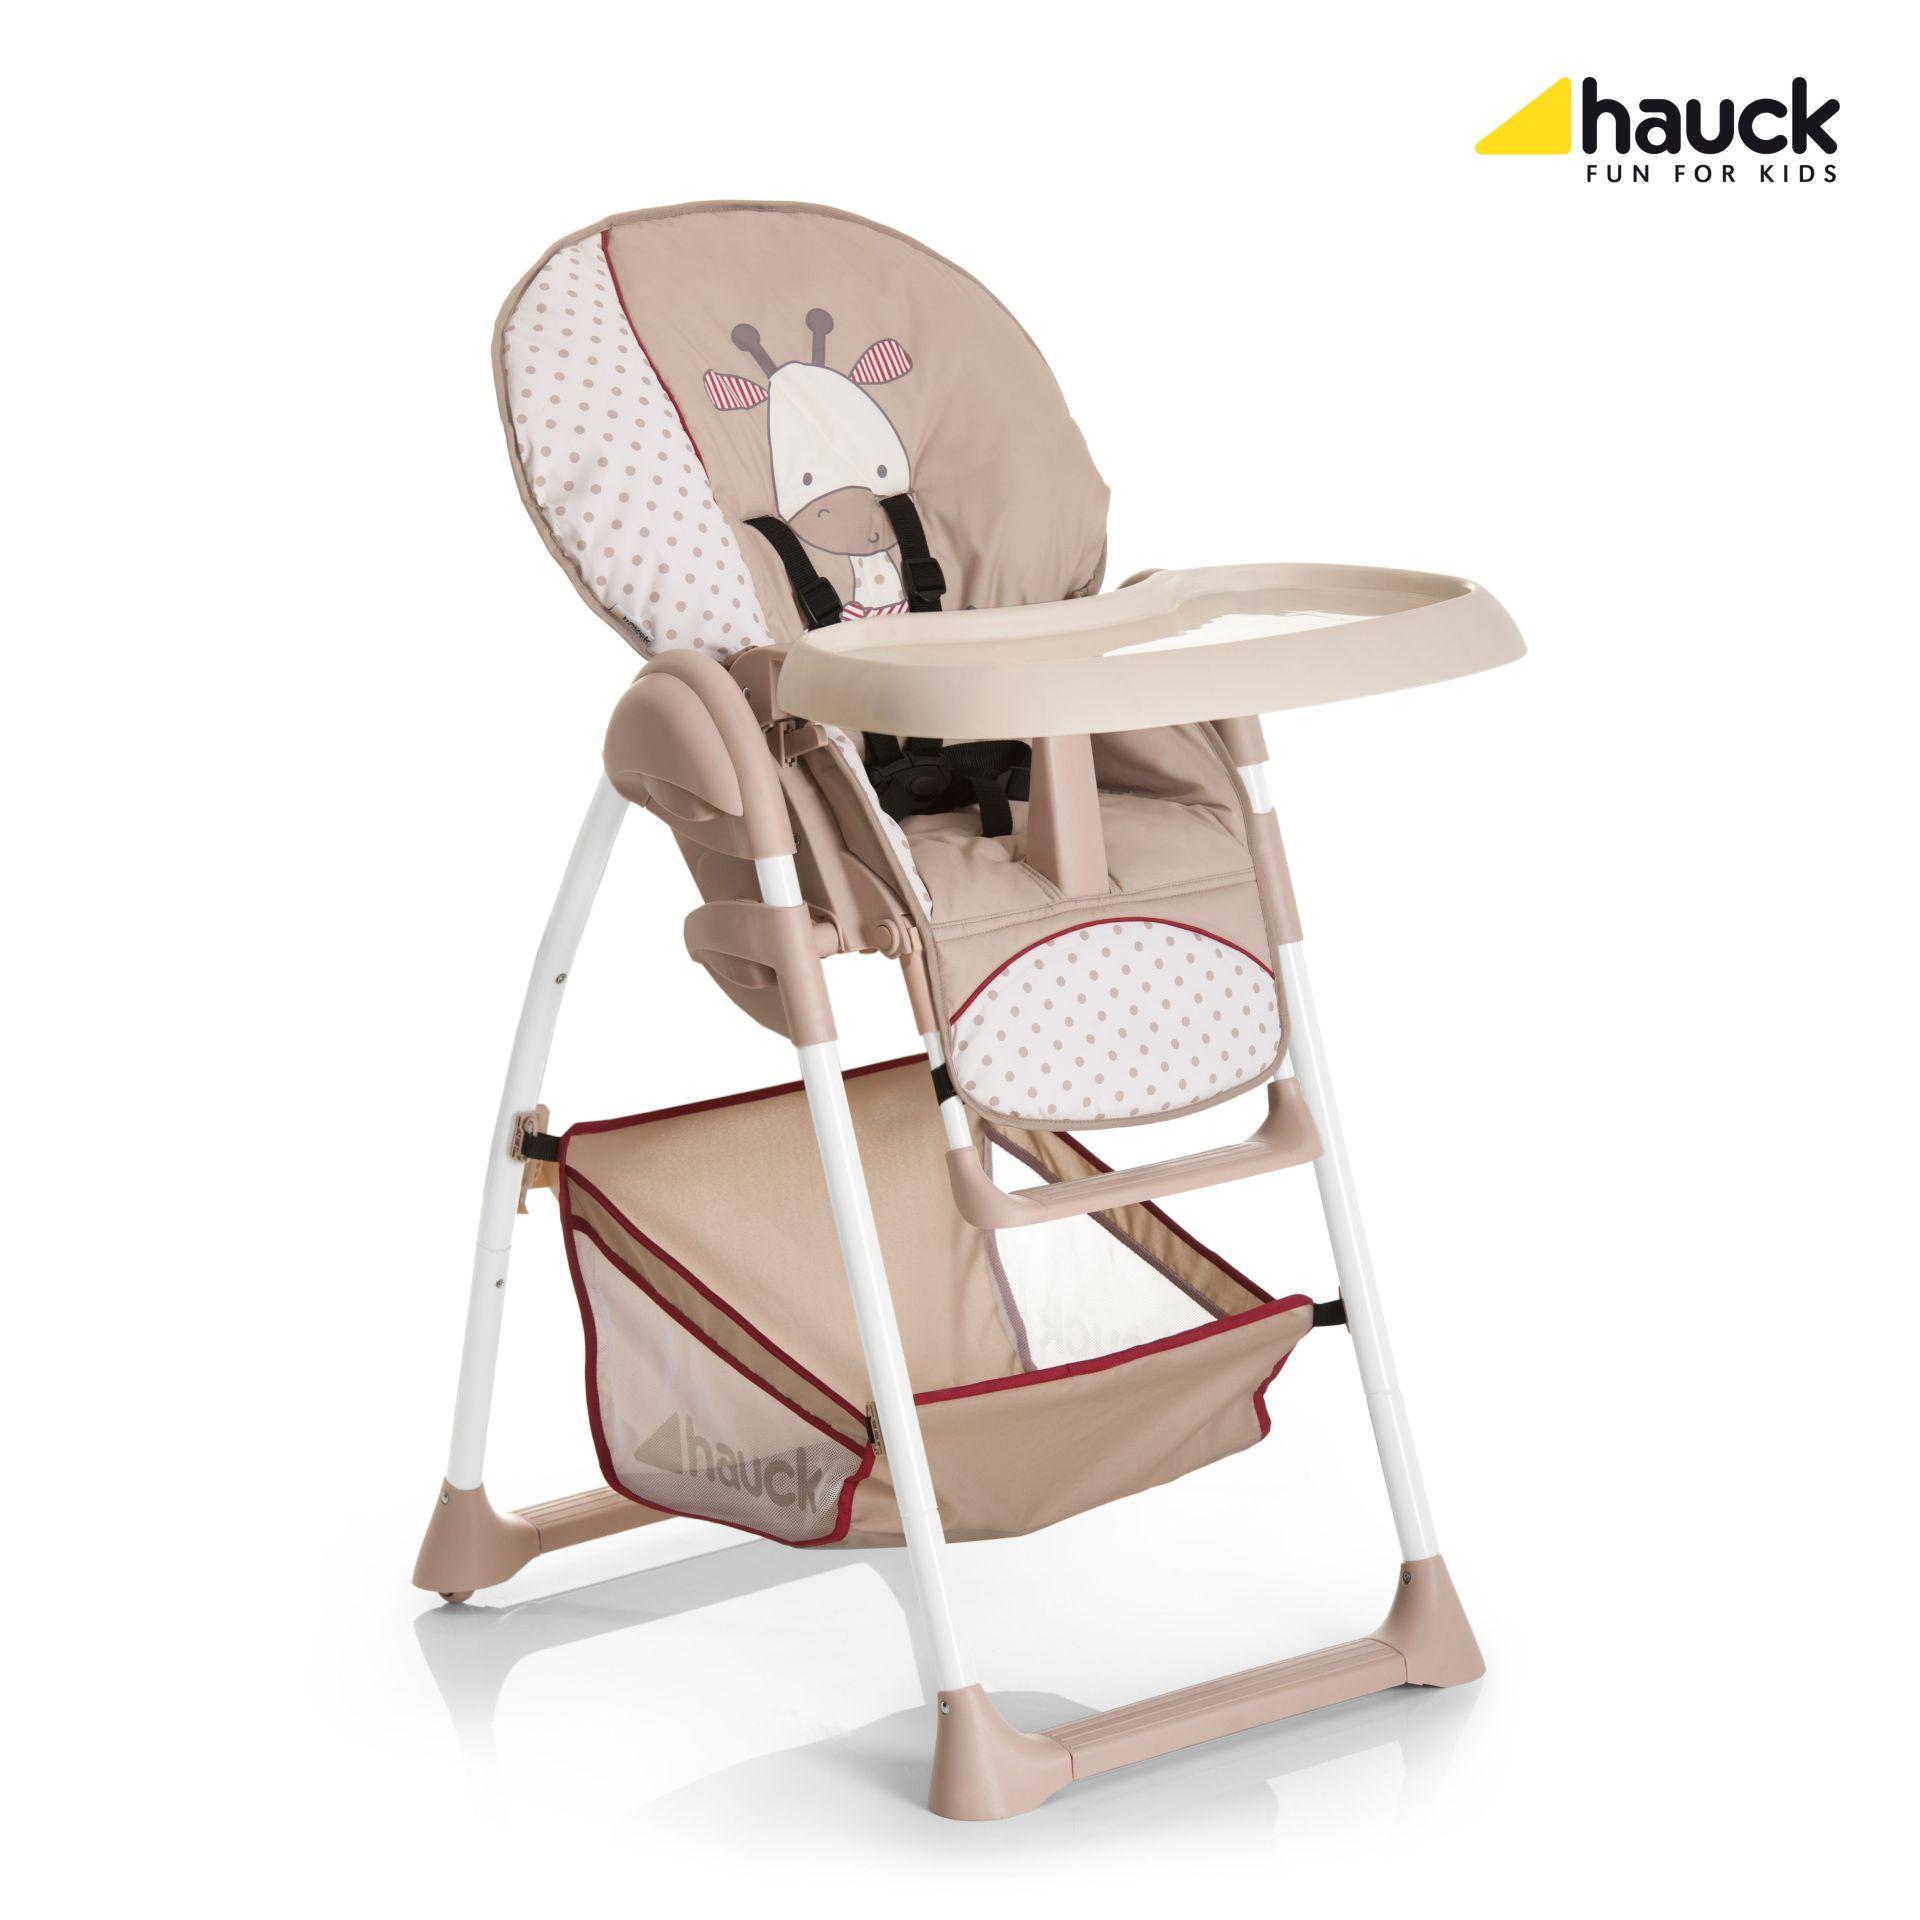 hauck high chair covers pottery barn highchair sitn relax 2018 giraffe buy at kidsroom